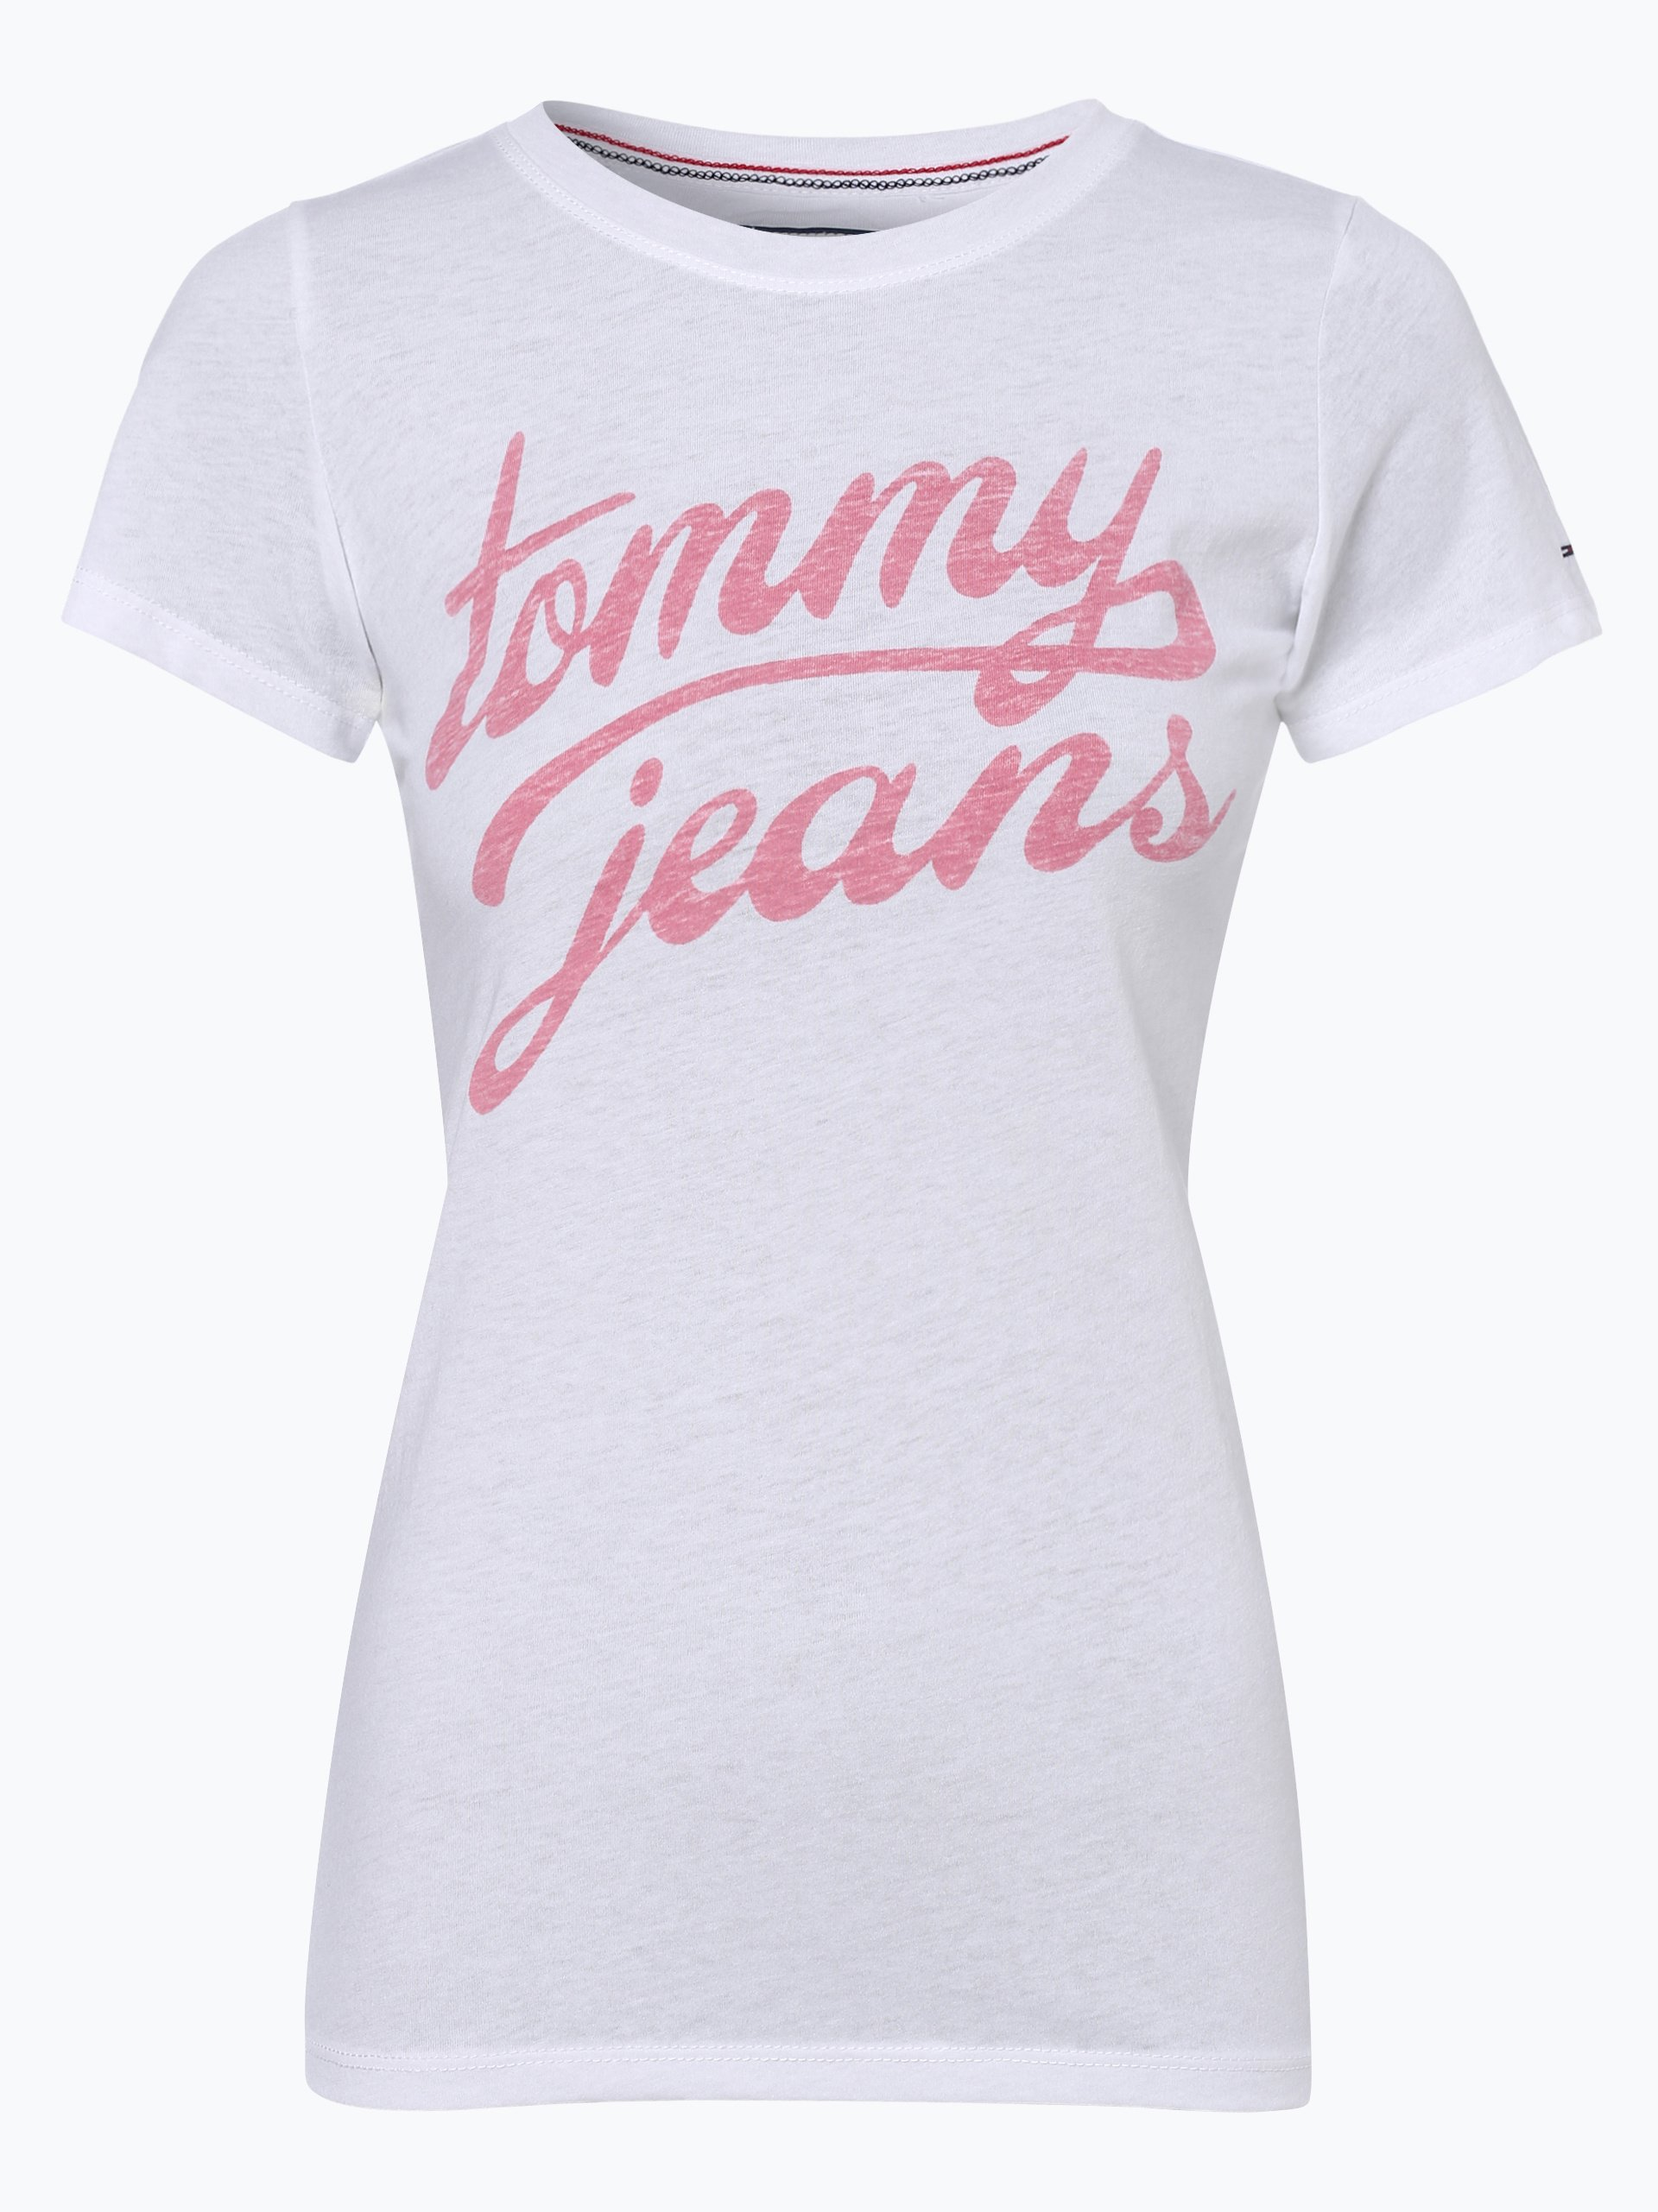 tommy jeans damen t shirt wei uni online kaufen. Black Bedroom Furniture Sets. Home Design Ideas